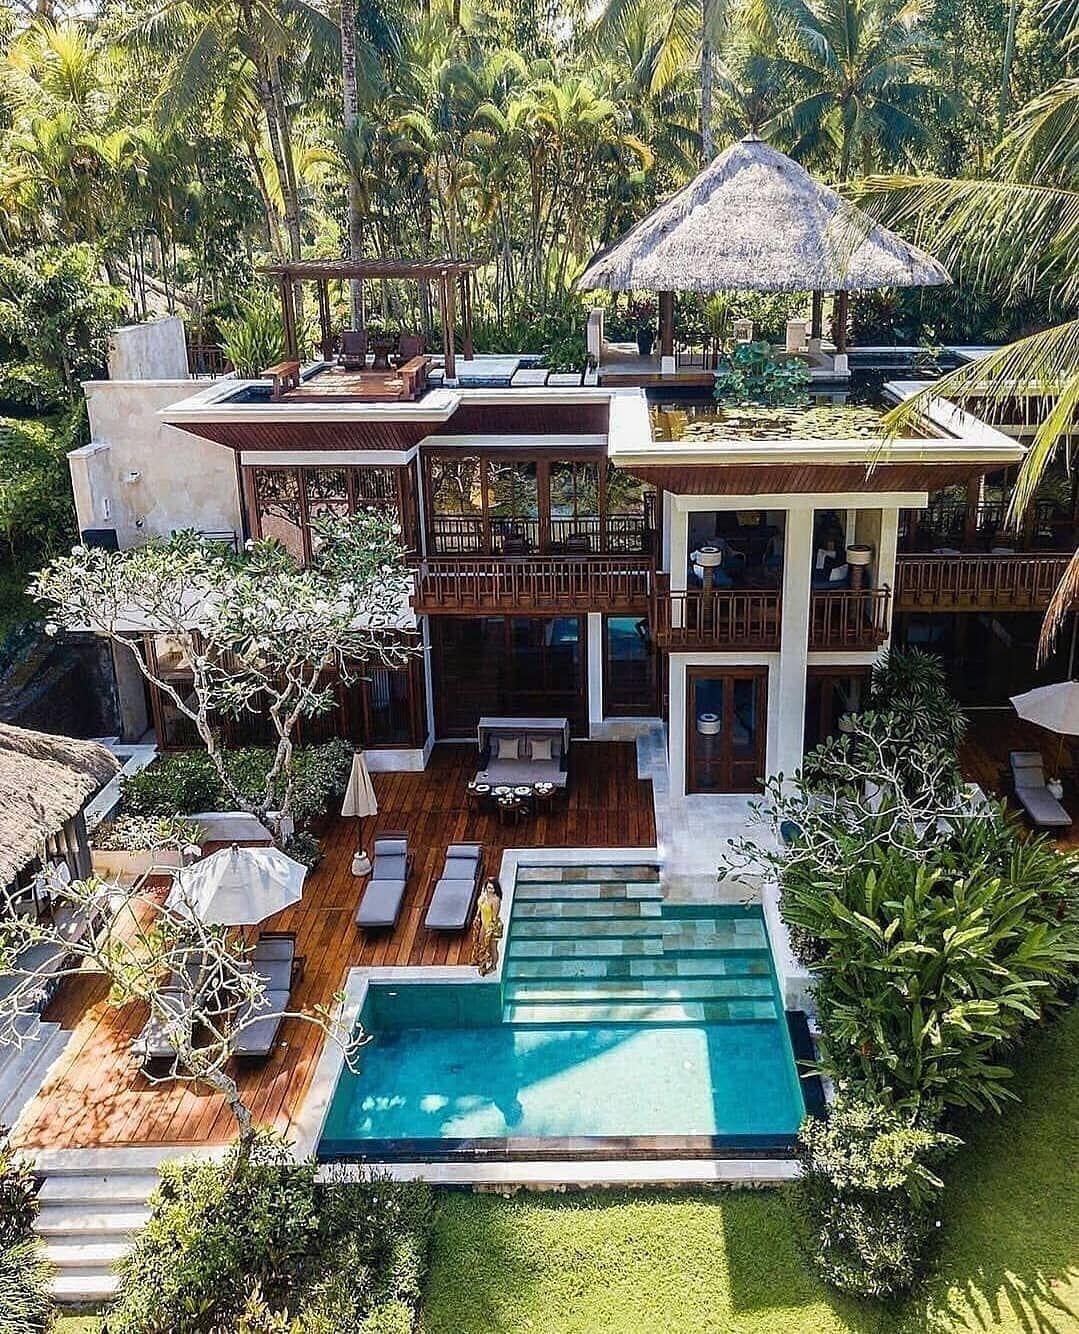 Impeccable Hotels On Instagram Jungle Villa Bali Indonesia Photo Missmariaquintero Bali Visitbali House Exterior Architecture House Architecture